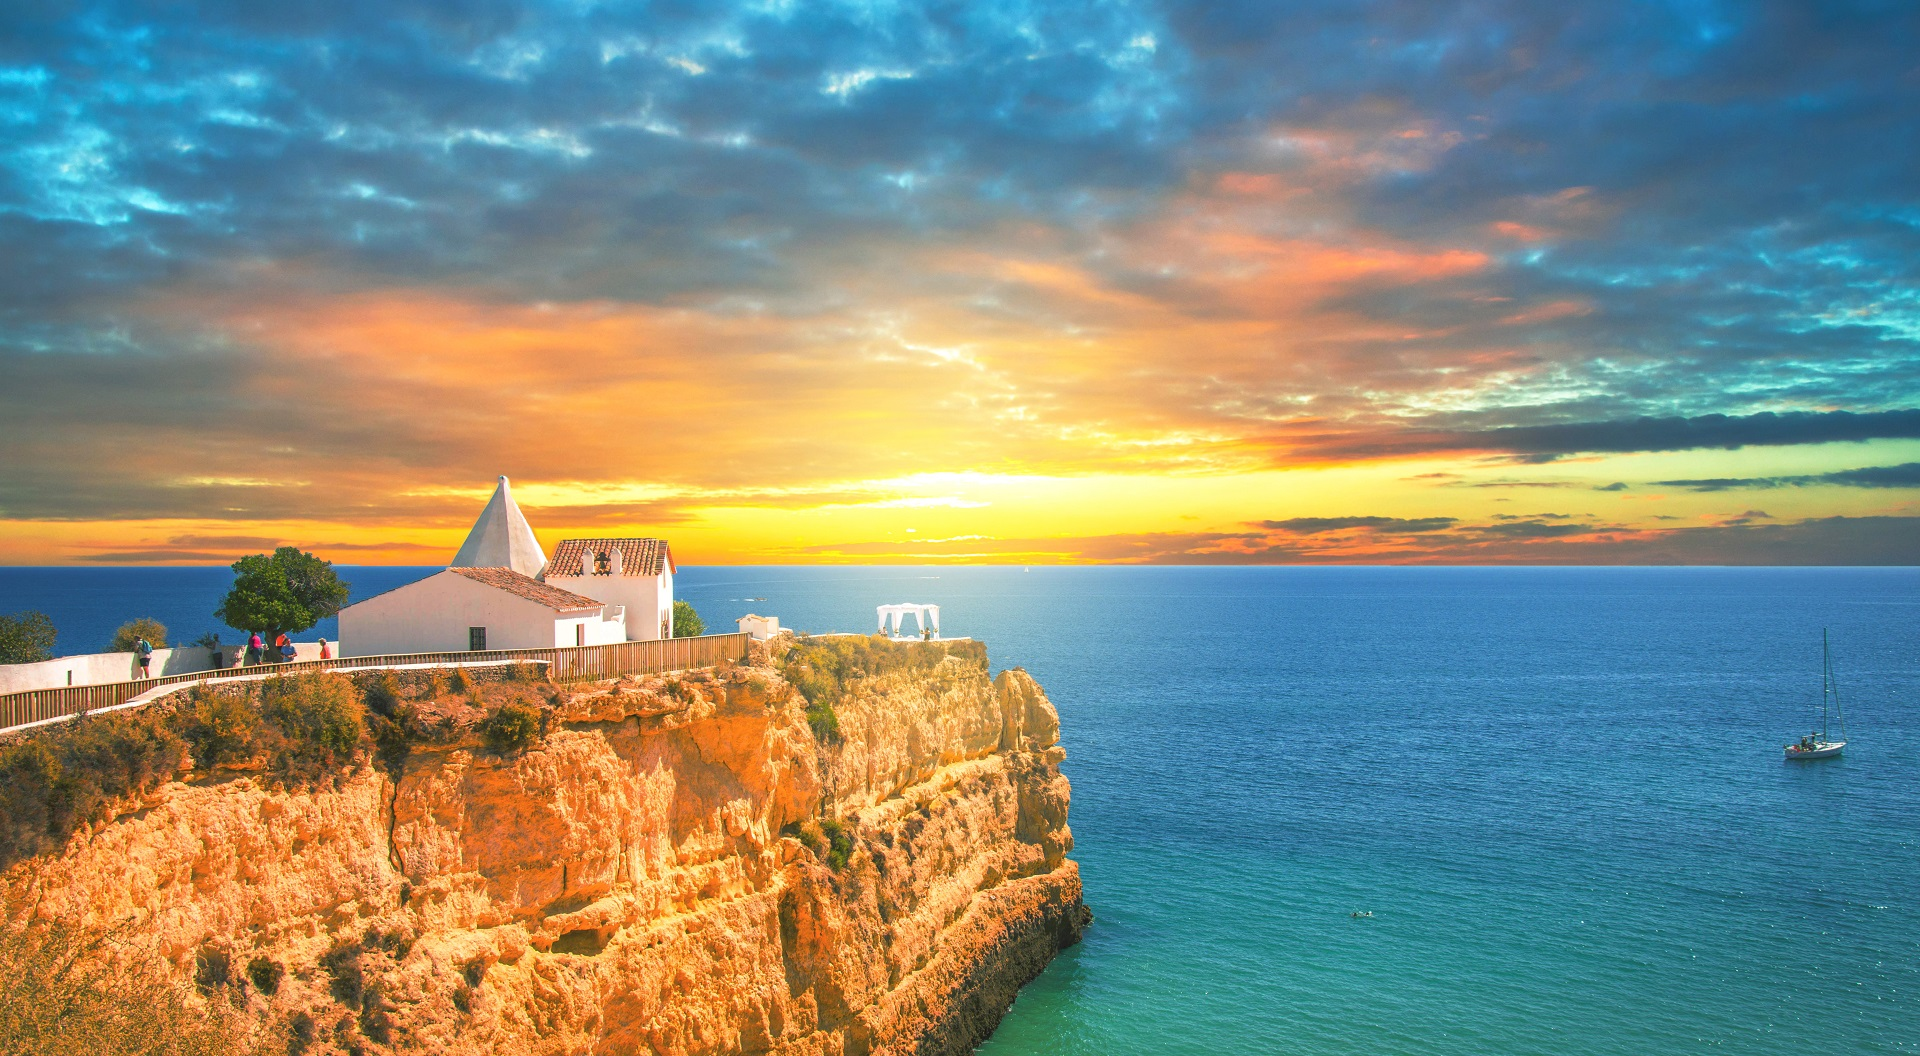 What is happening in the Algarve regarding Covid-19